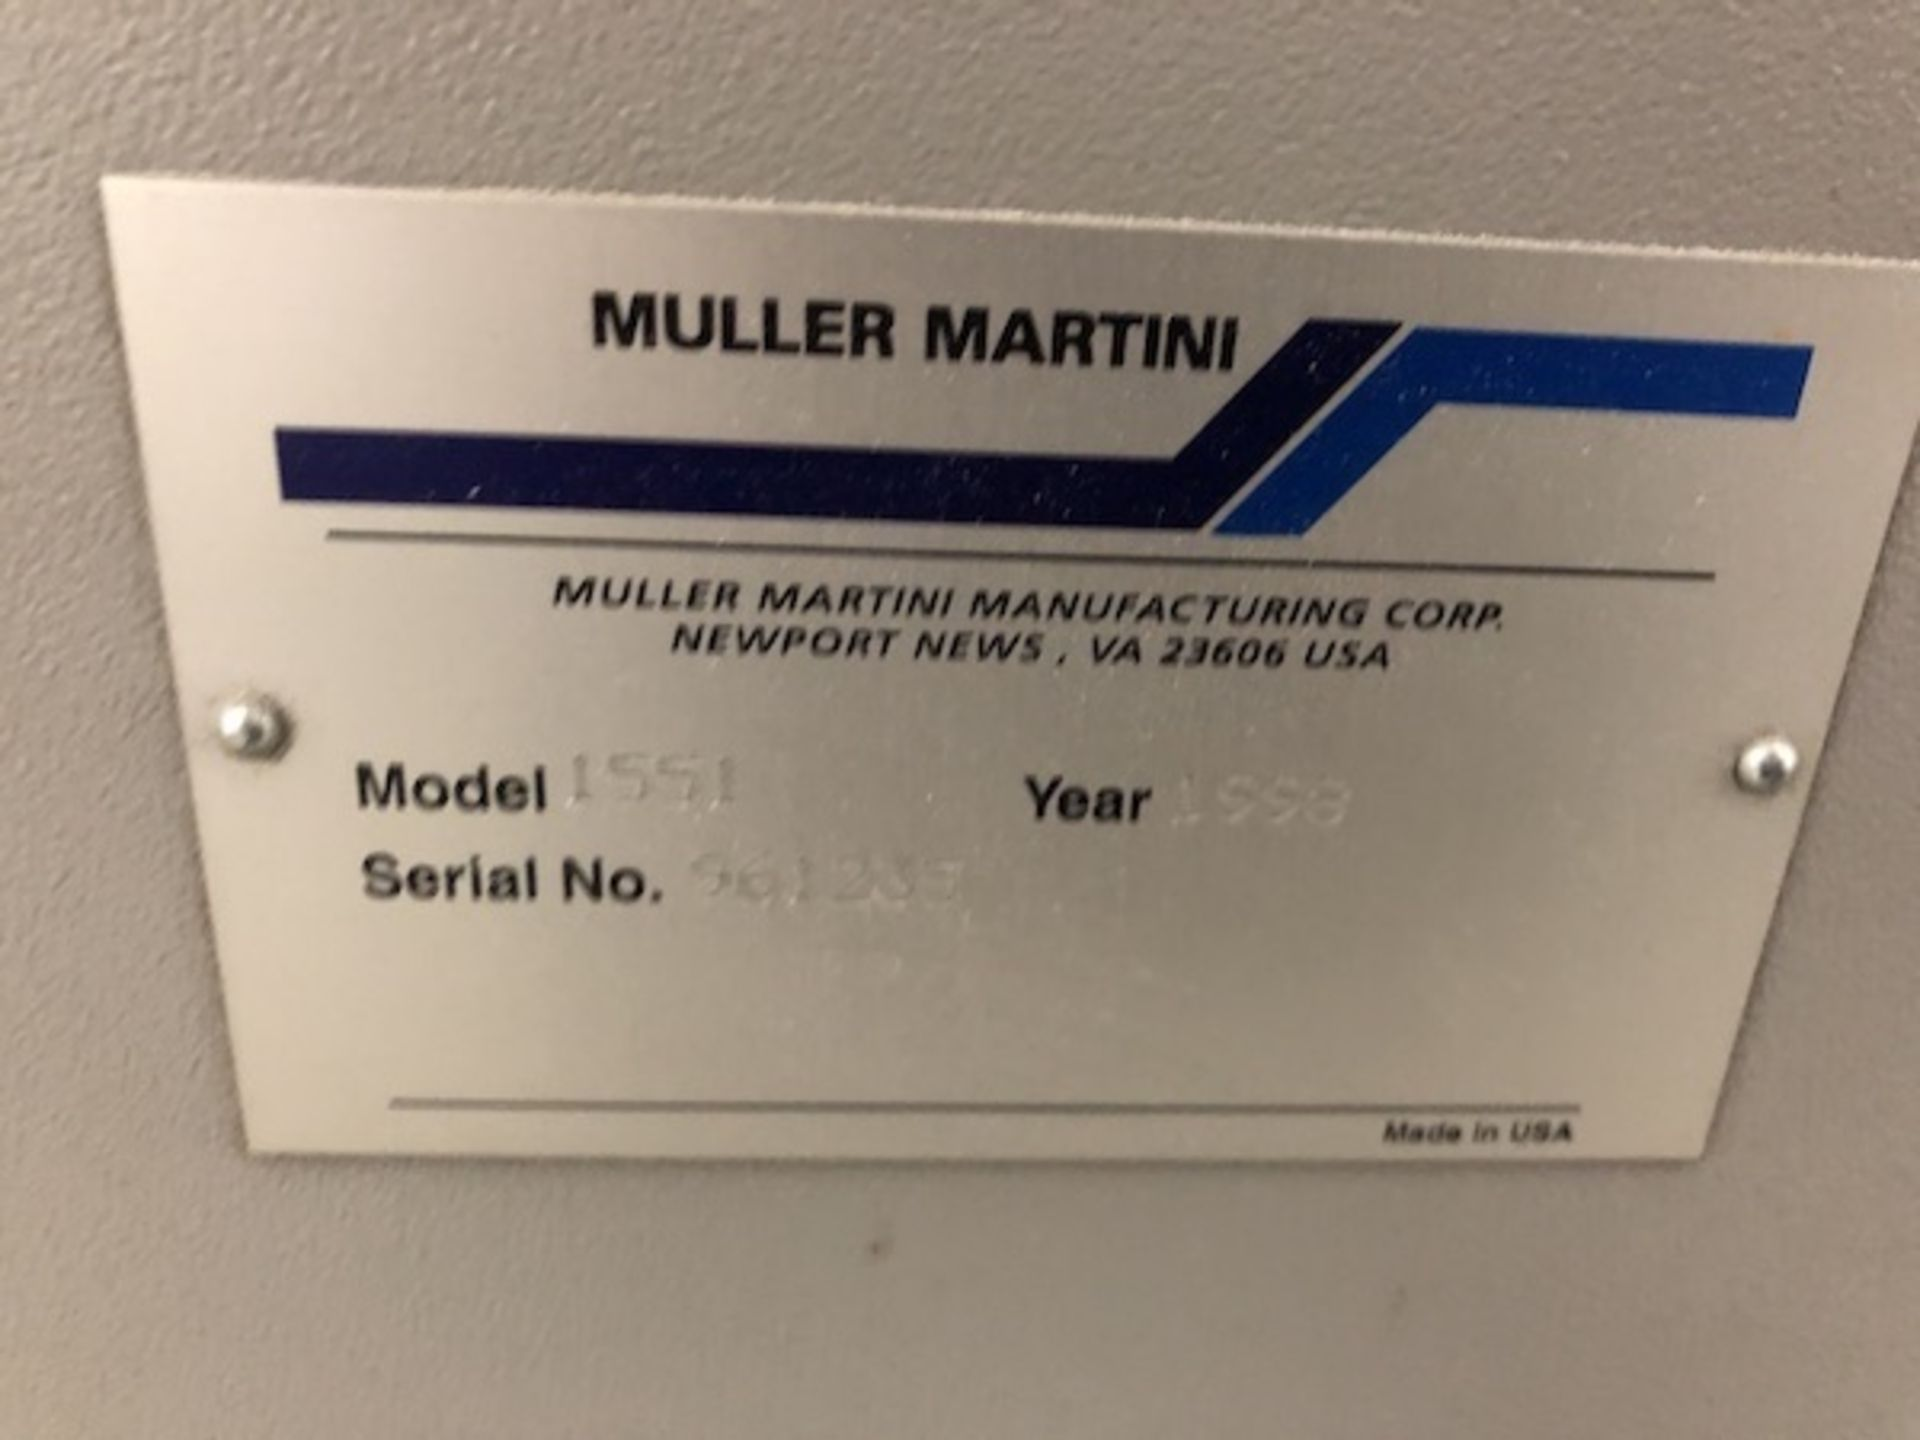 Lot 8 - Muller Martini Presto Saddle Stitcher